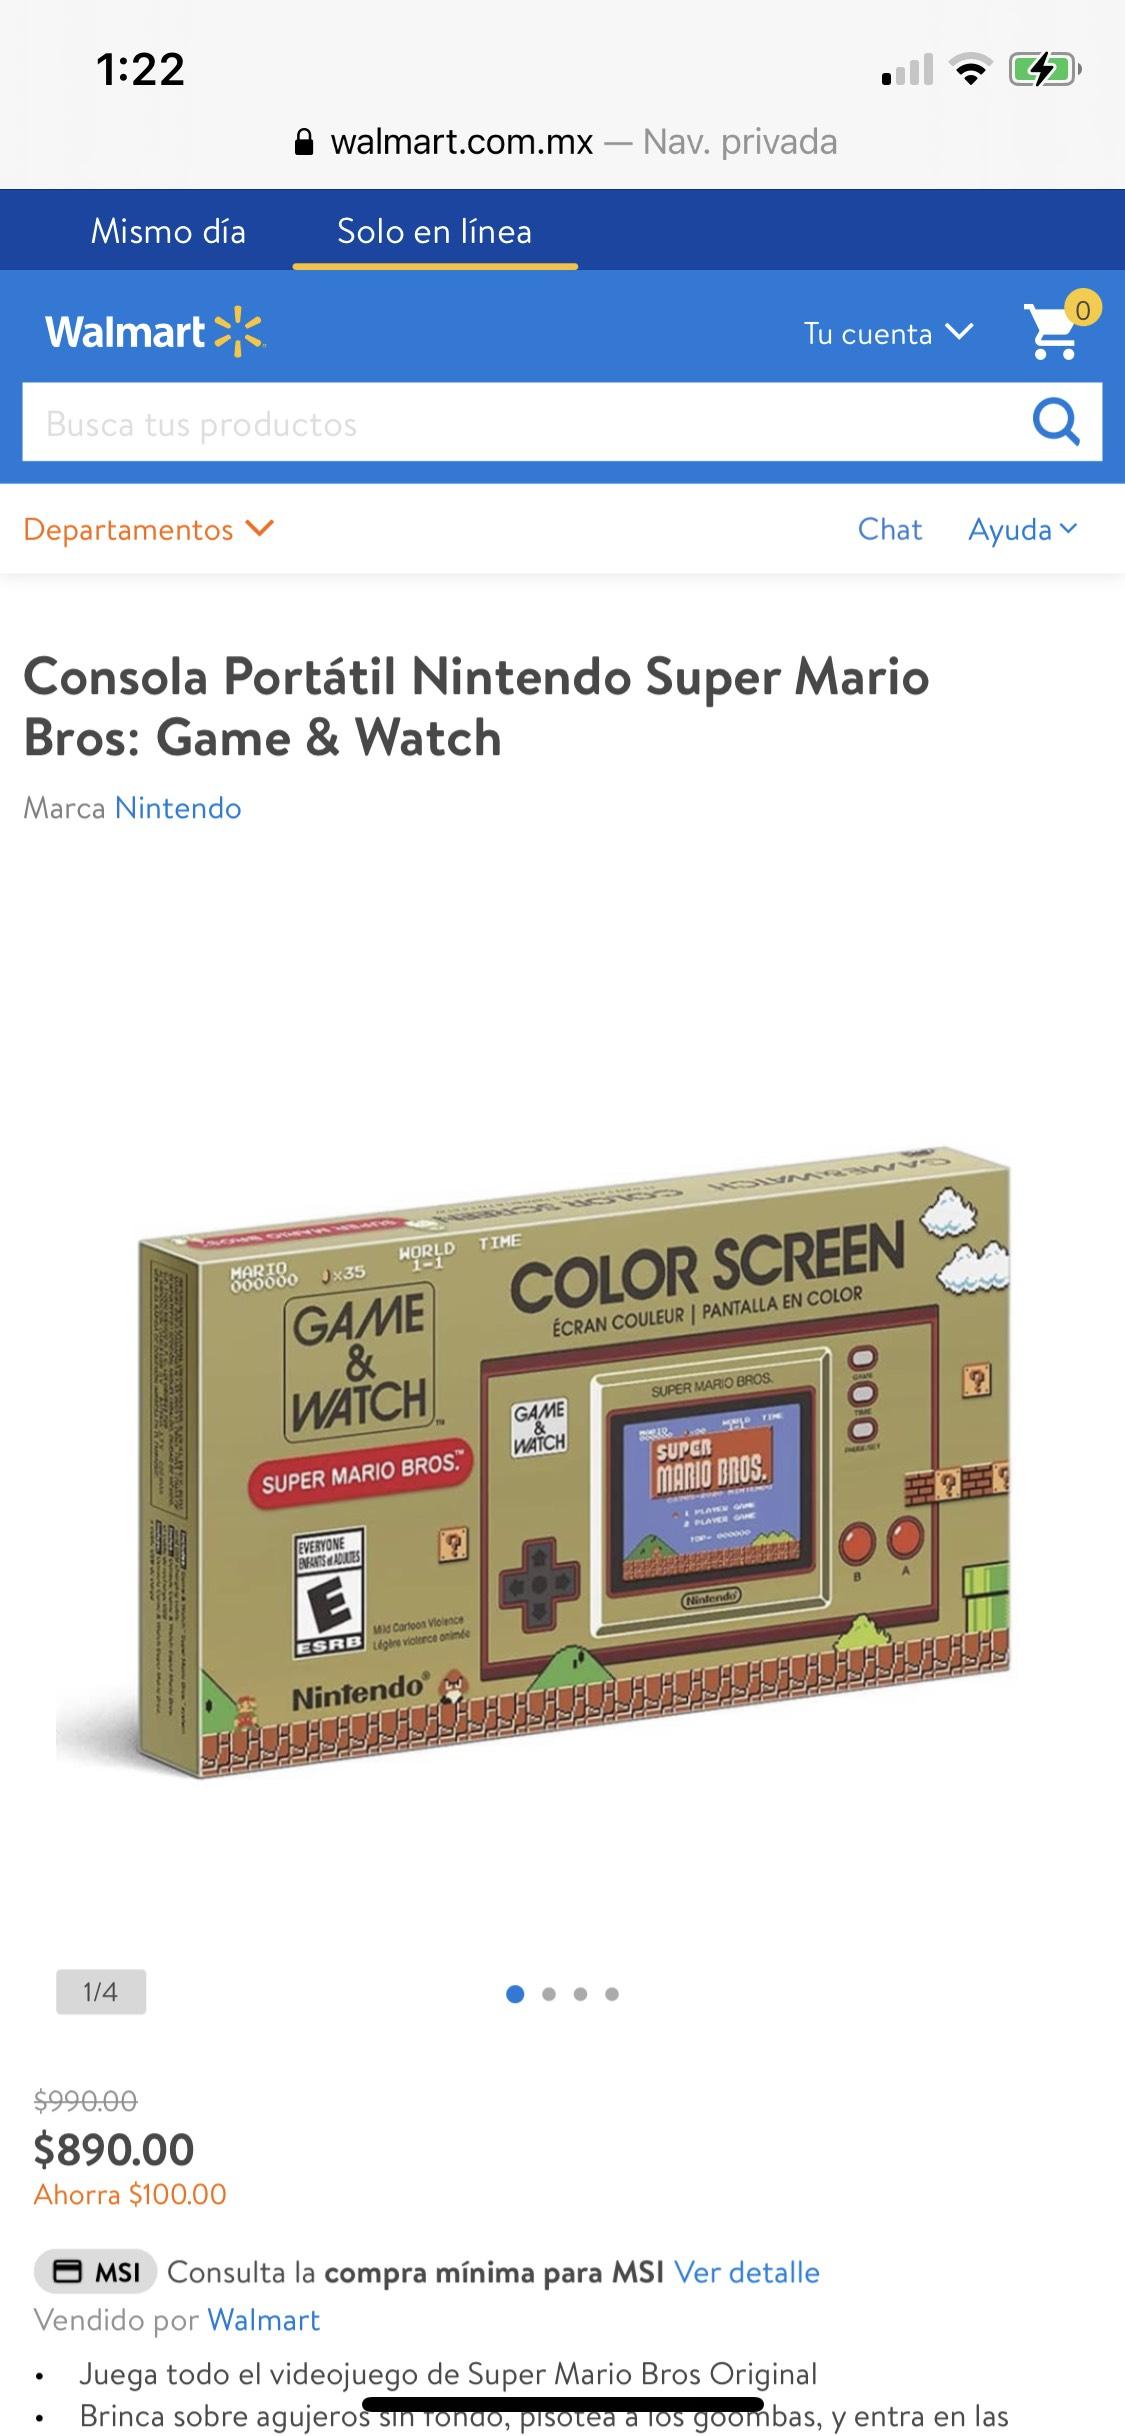 Walmart Nintendo Game & Watch $890